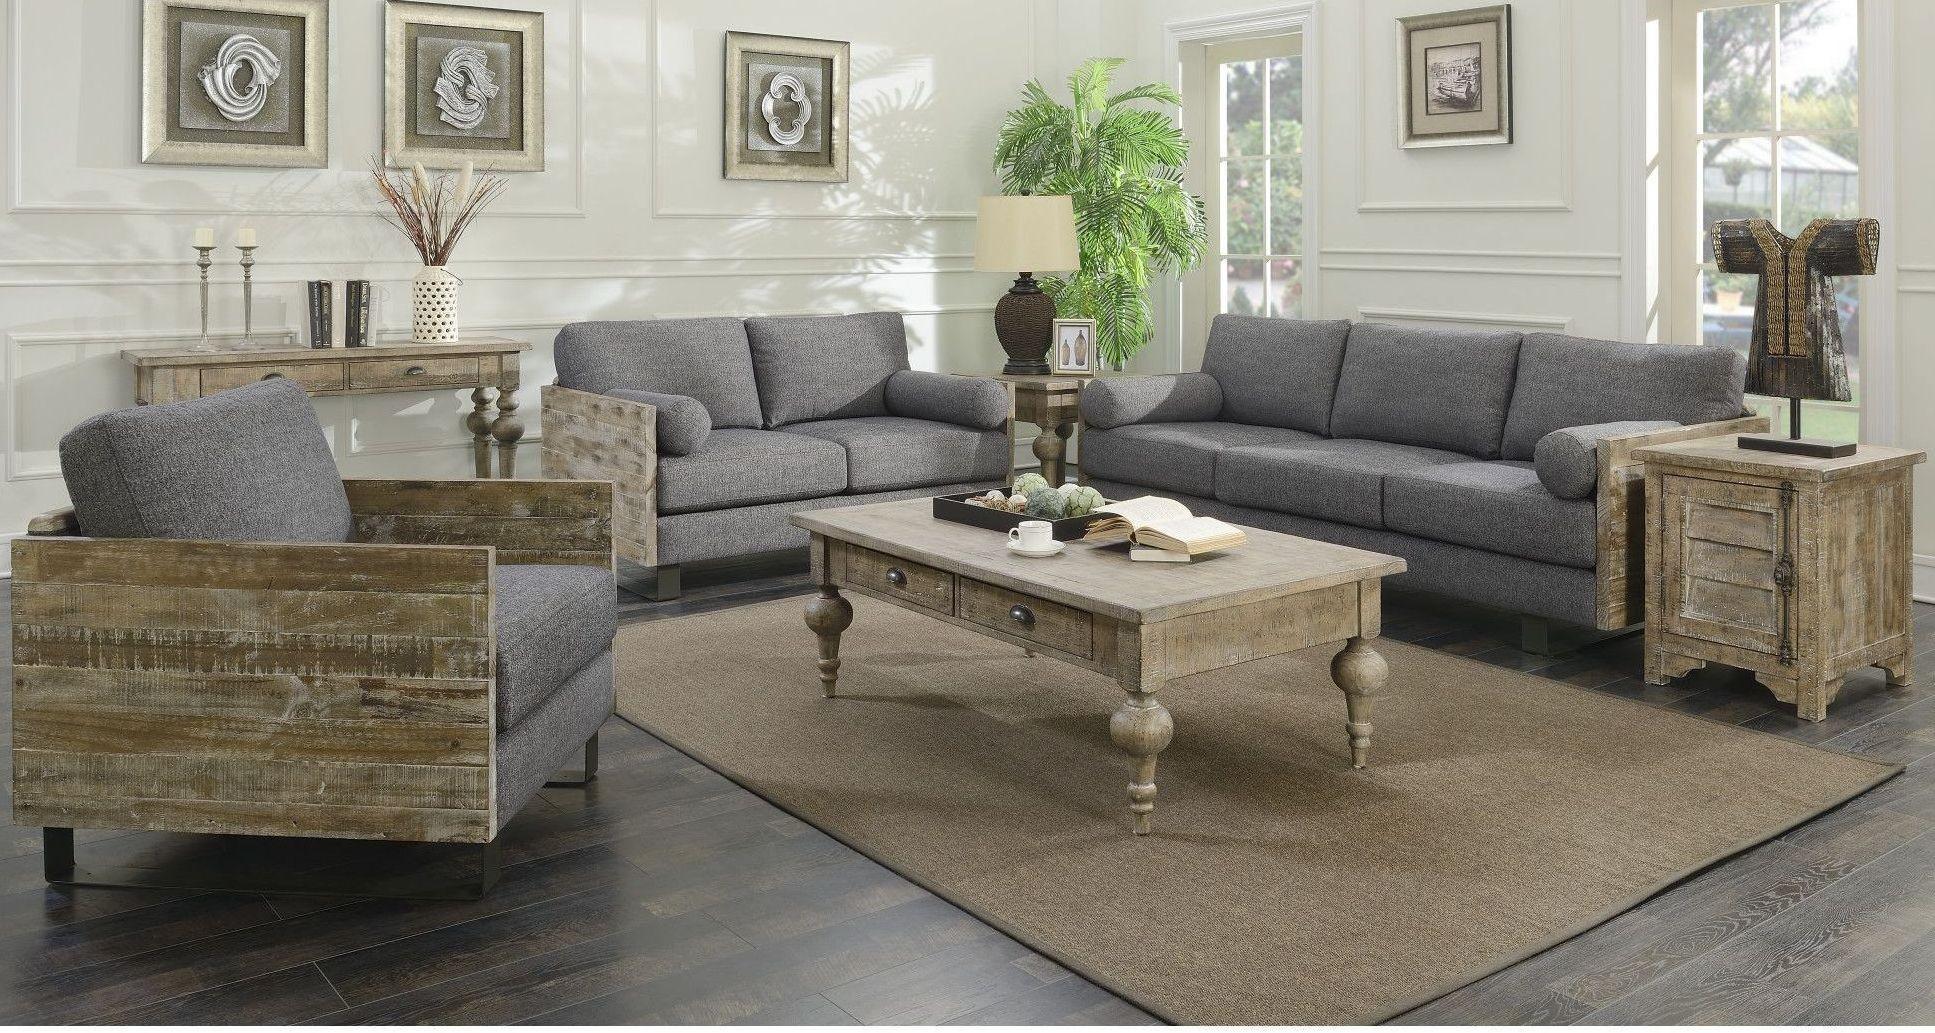 Interlude Charcoal Blue Living Room Set U5600 00 03 U5600 01 03 Emerald Home Furnishings